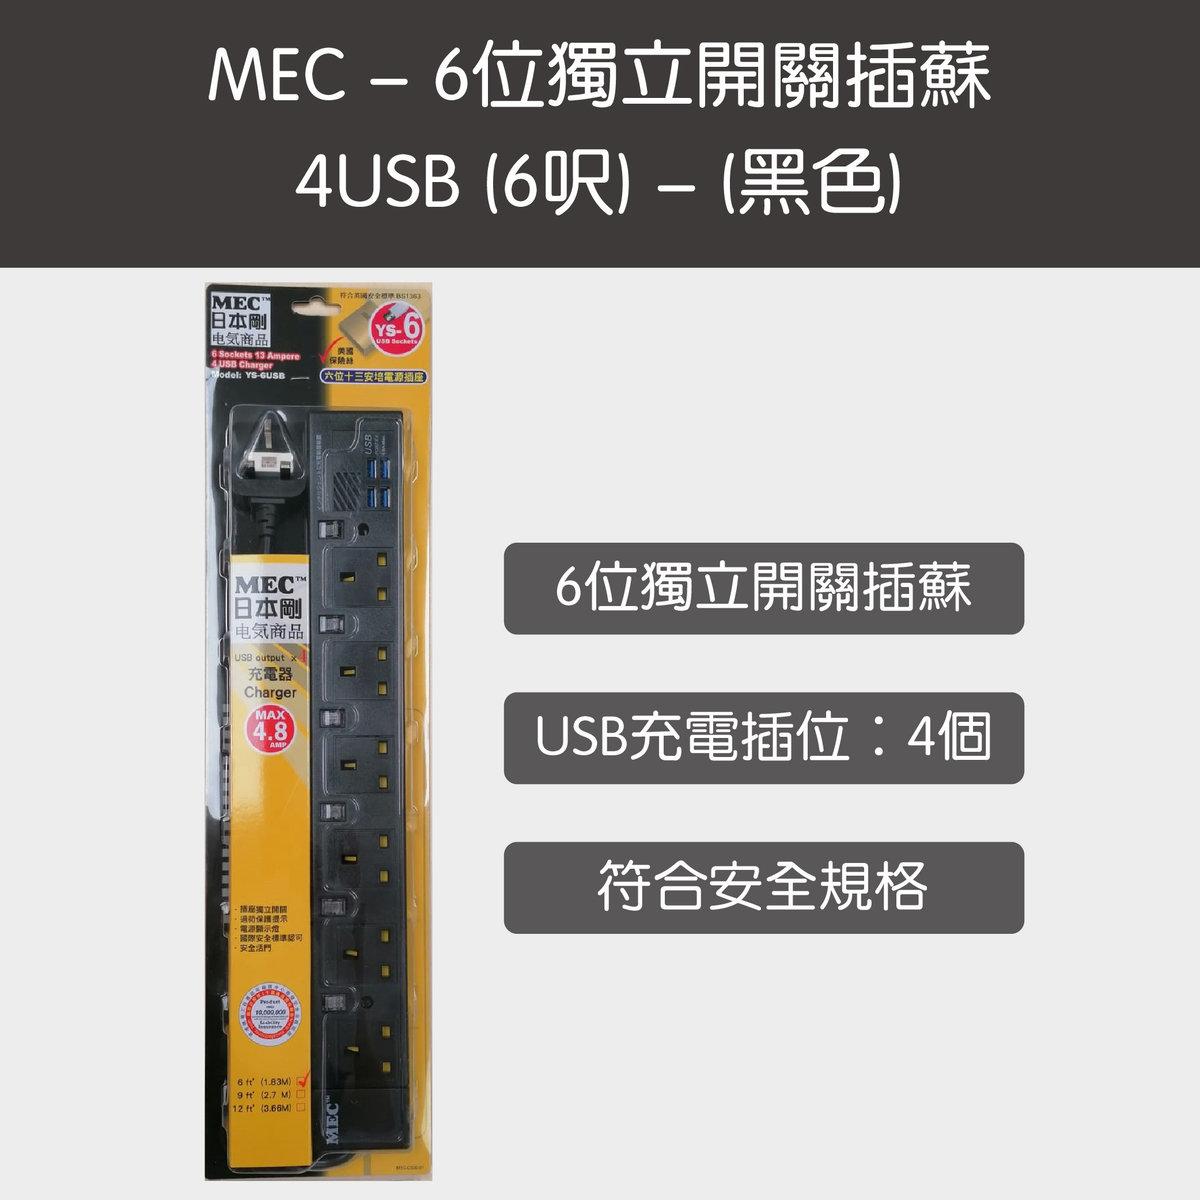 MEC - 6 SOCKET POWERBAR BUILT-IN POWER SWITCH + 4USB (6 feet) Max output 4.8A YS-6 (BLACK)